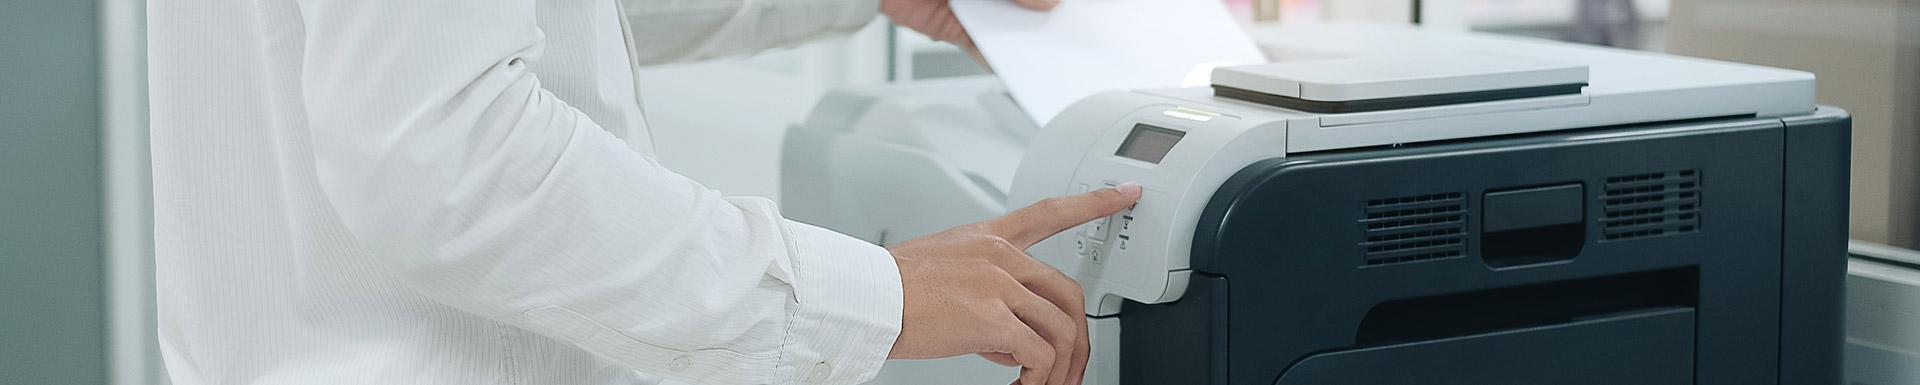 Koopadvies zakelijke printer